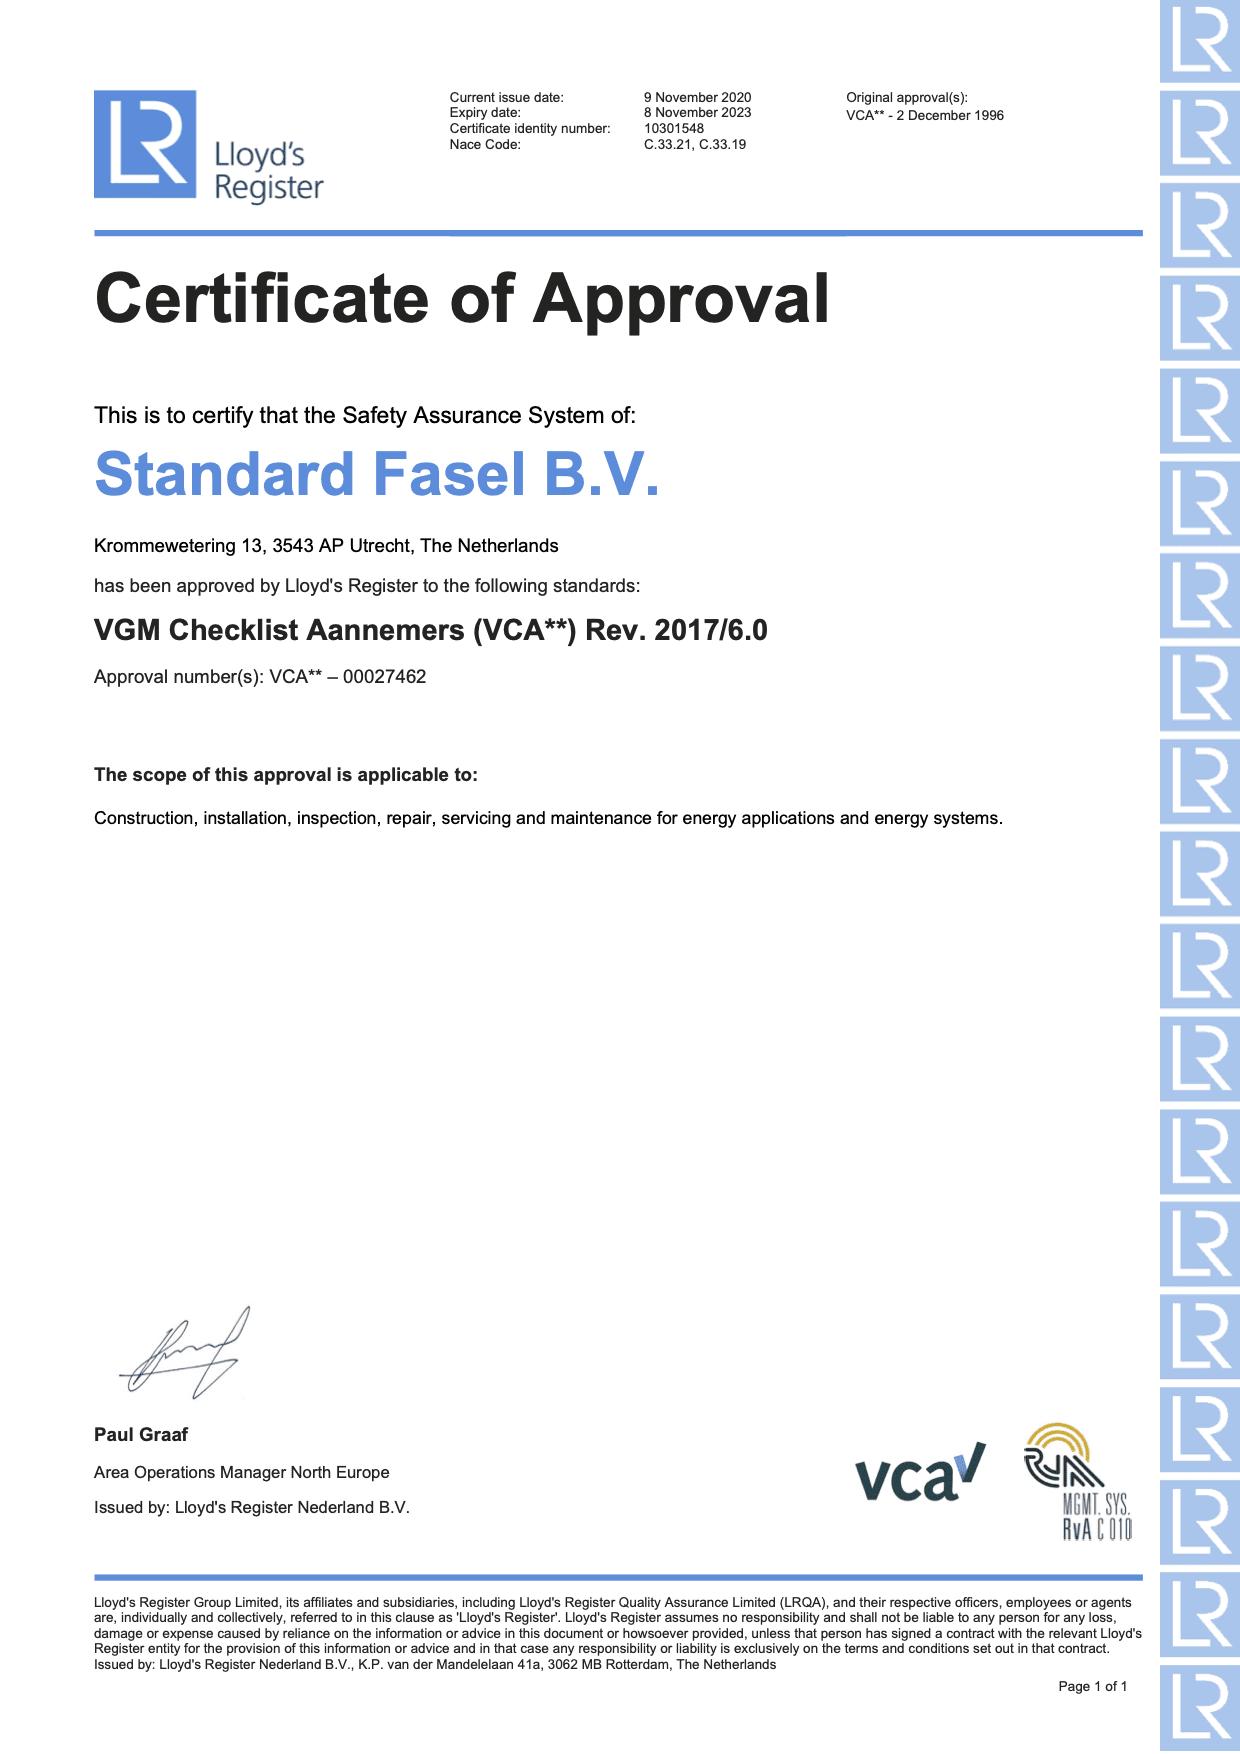 Vca certificaat standard fasel